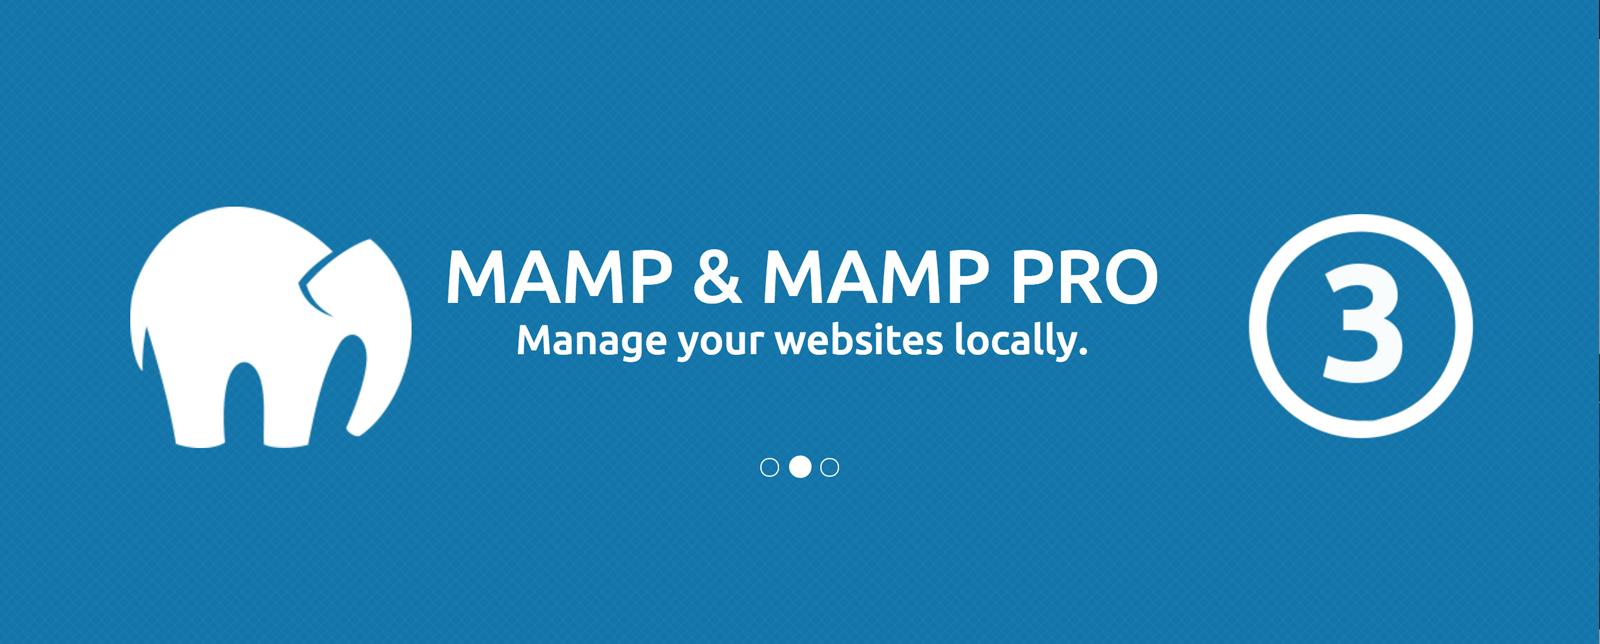 My local wordpress MAMP site slow | Surf the Dream